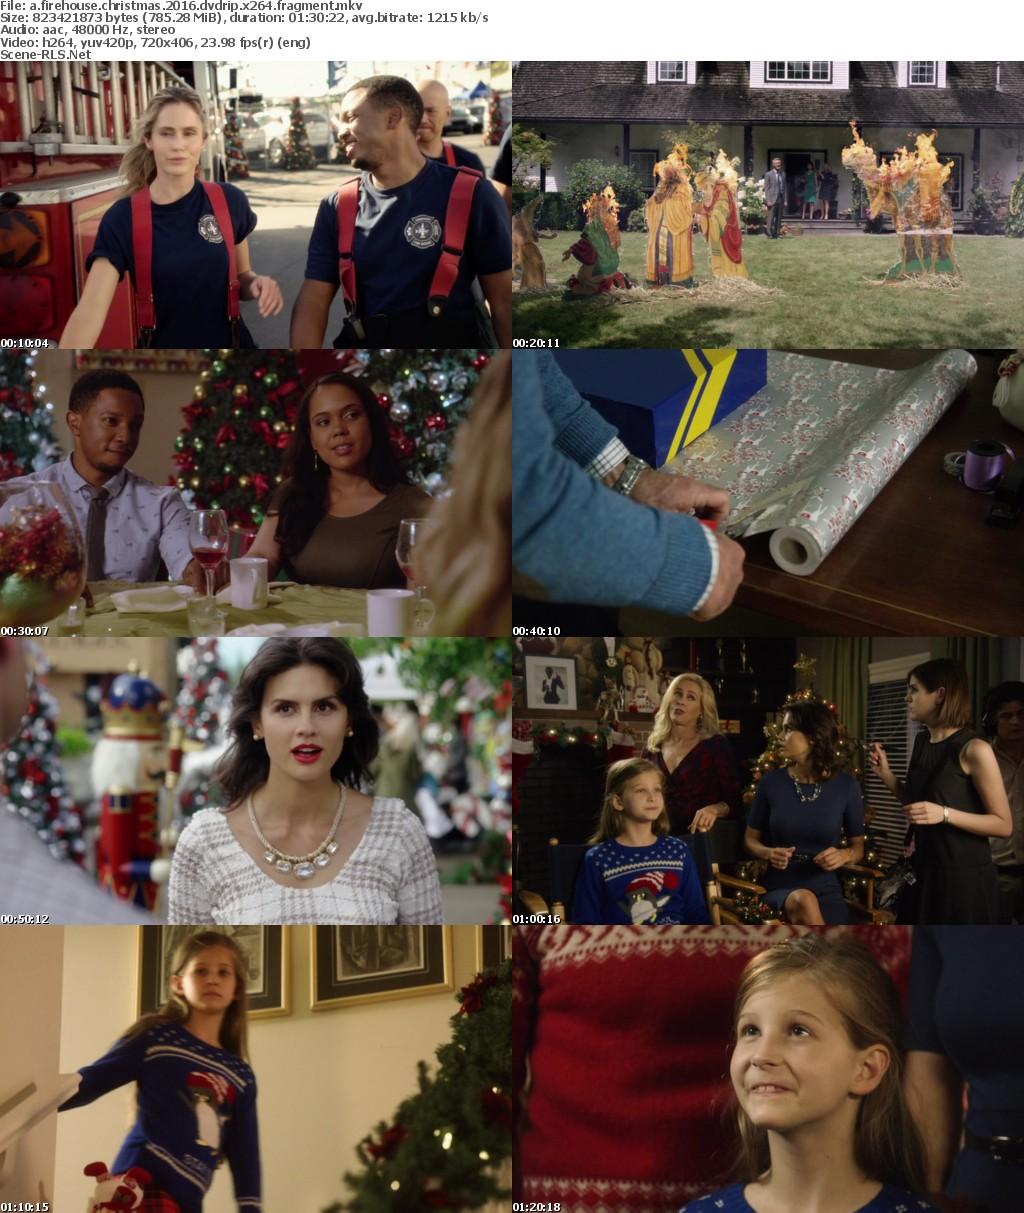 A Firehouse Christmas.A Firehouse Christmas 2016 Dvdrip X264 Fragment Scene Release